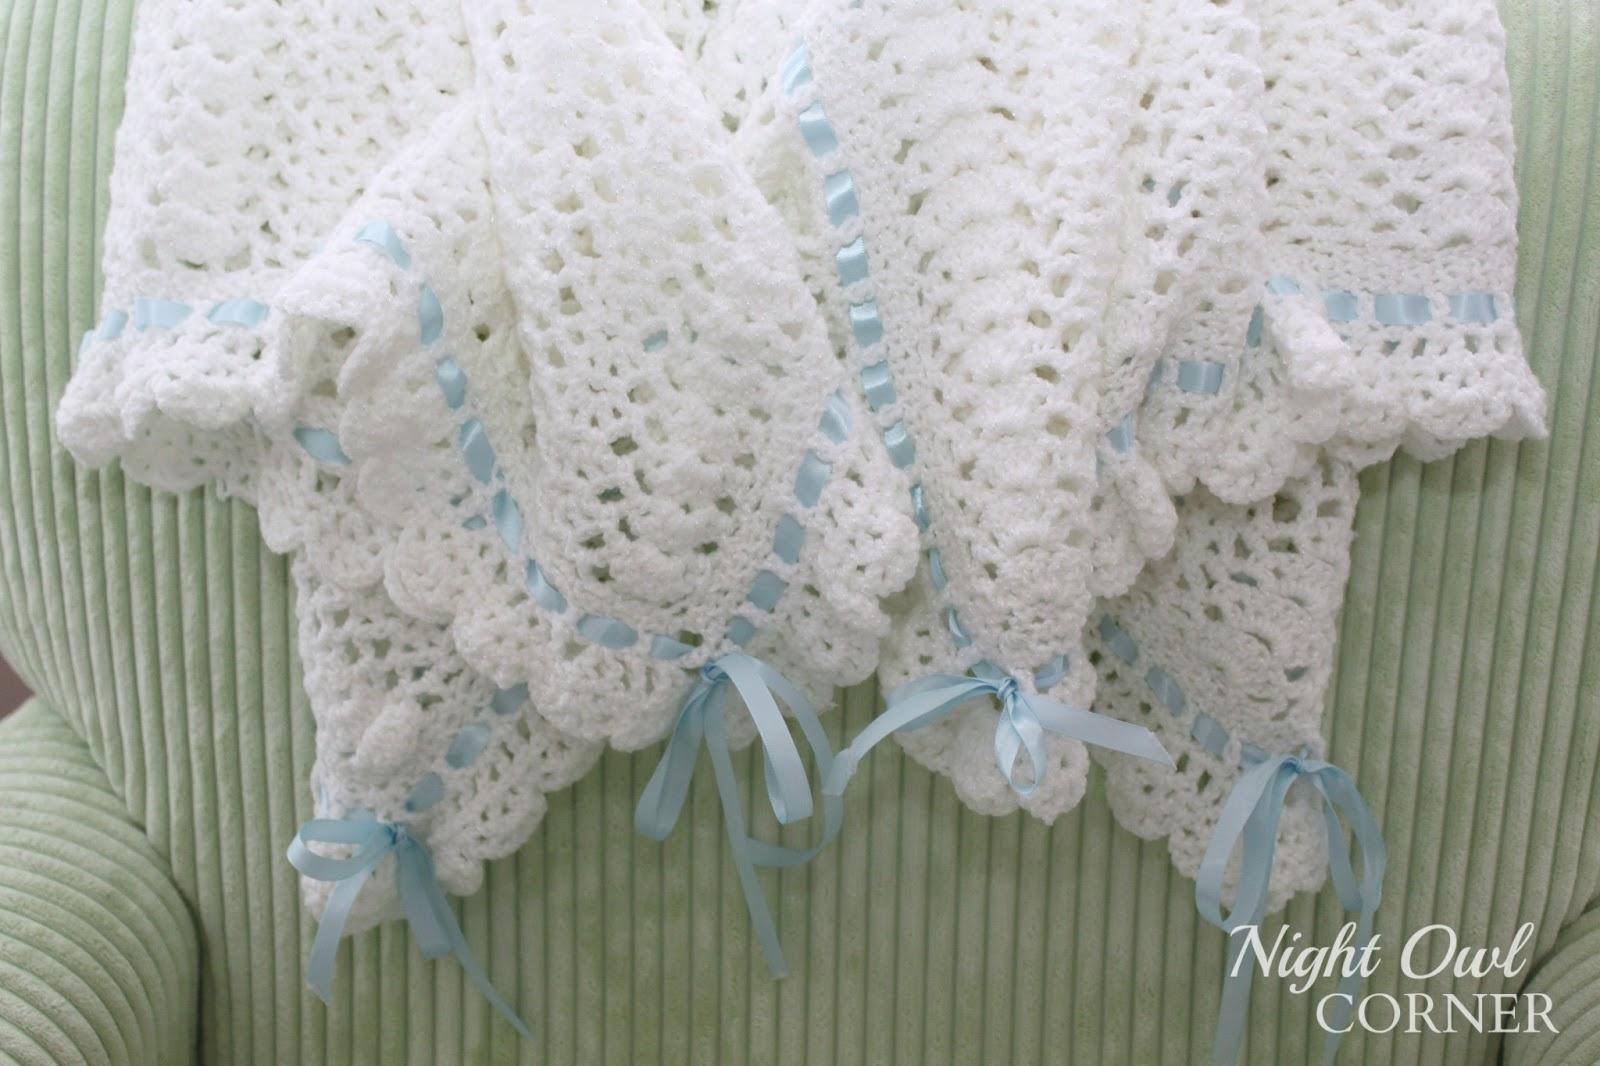 Night Owl Corner: Ribbons and Ruffles Baby Blanket